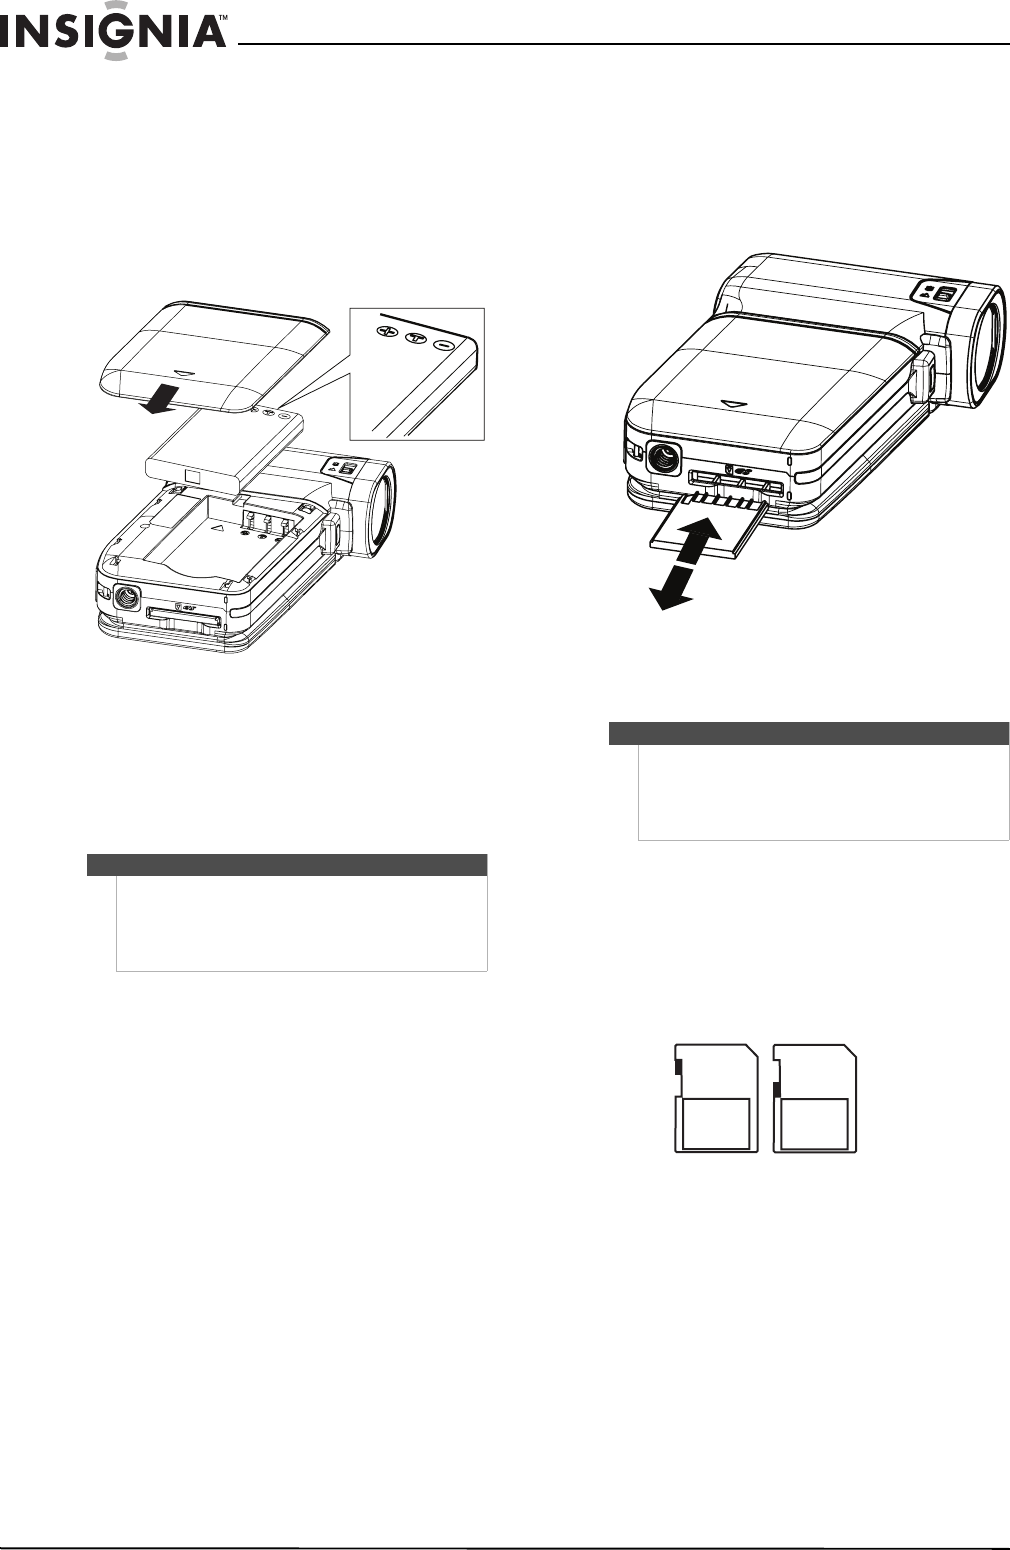 Insignia Ns Dv720Pbl2 Users Manual